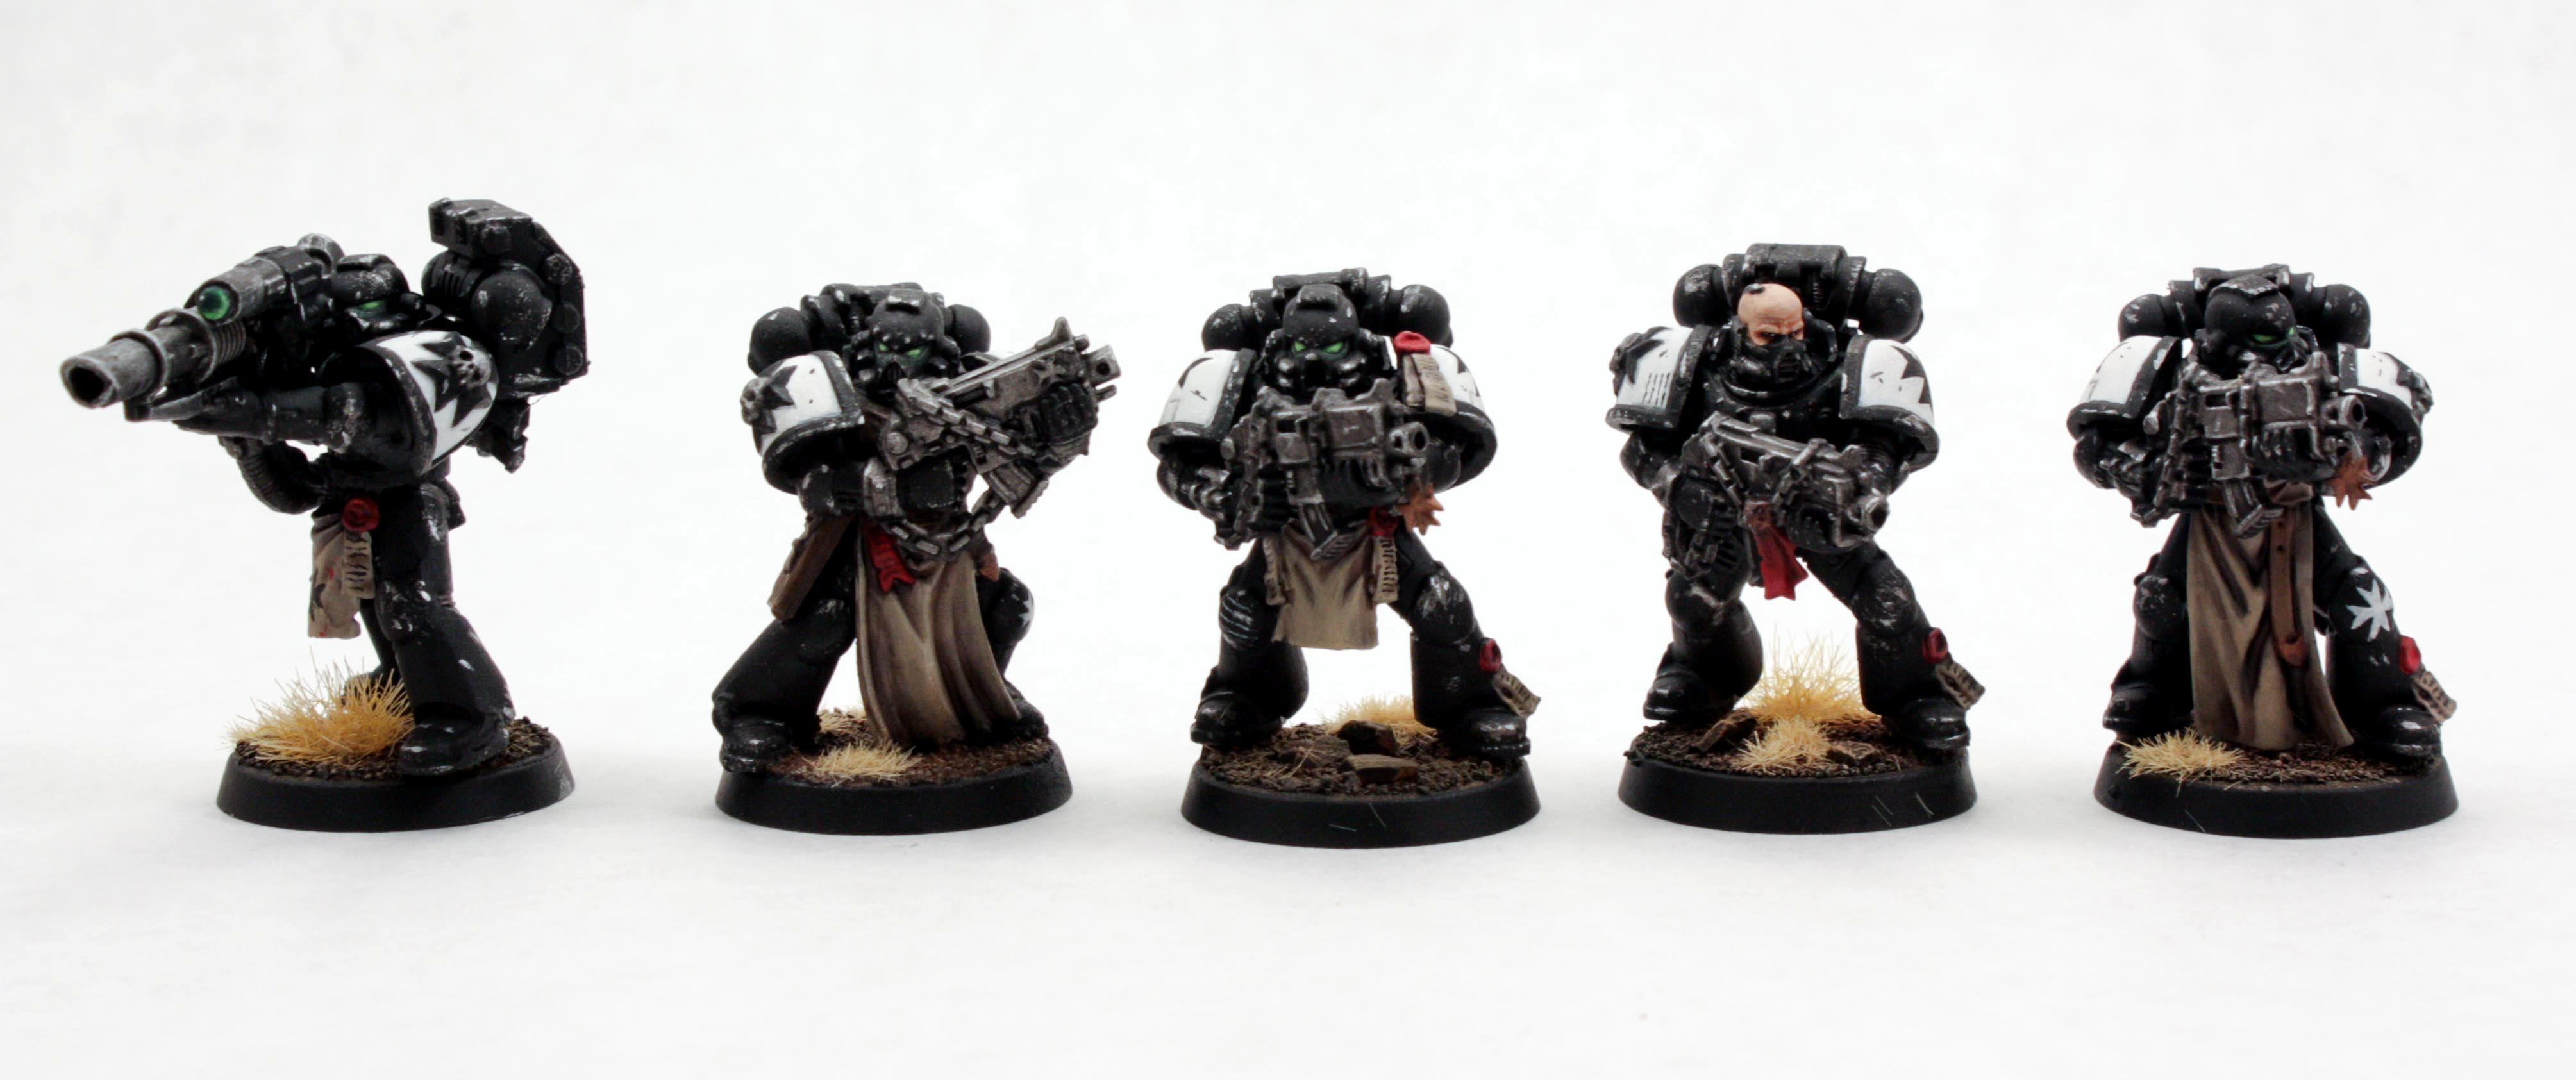 Black, Crusader, Space Marines, Tactical, Templars